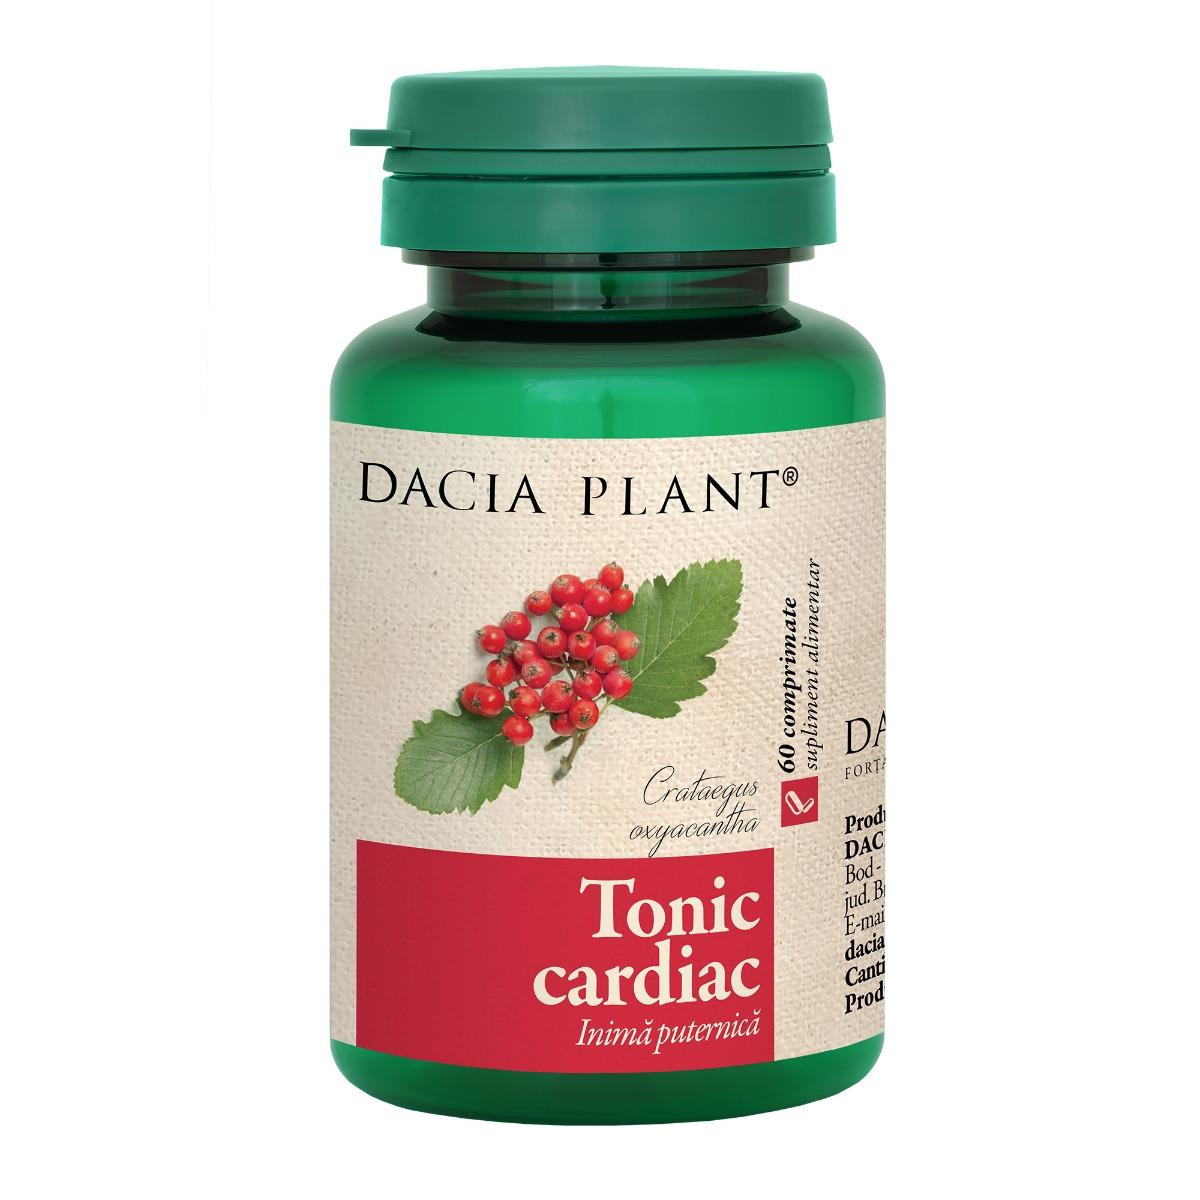 Tonic cardiac, 60 comprimate, Dacia Plant drmax.ro